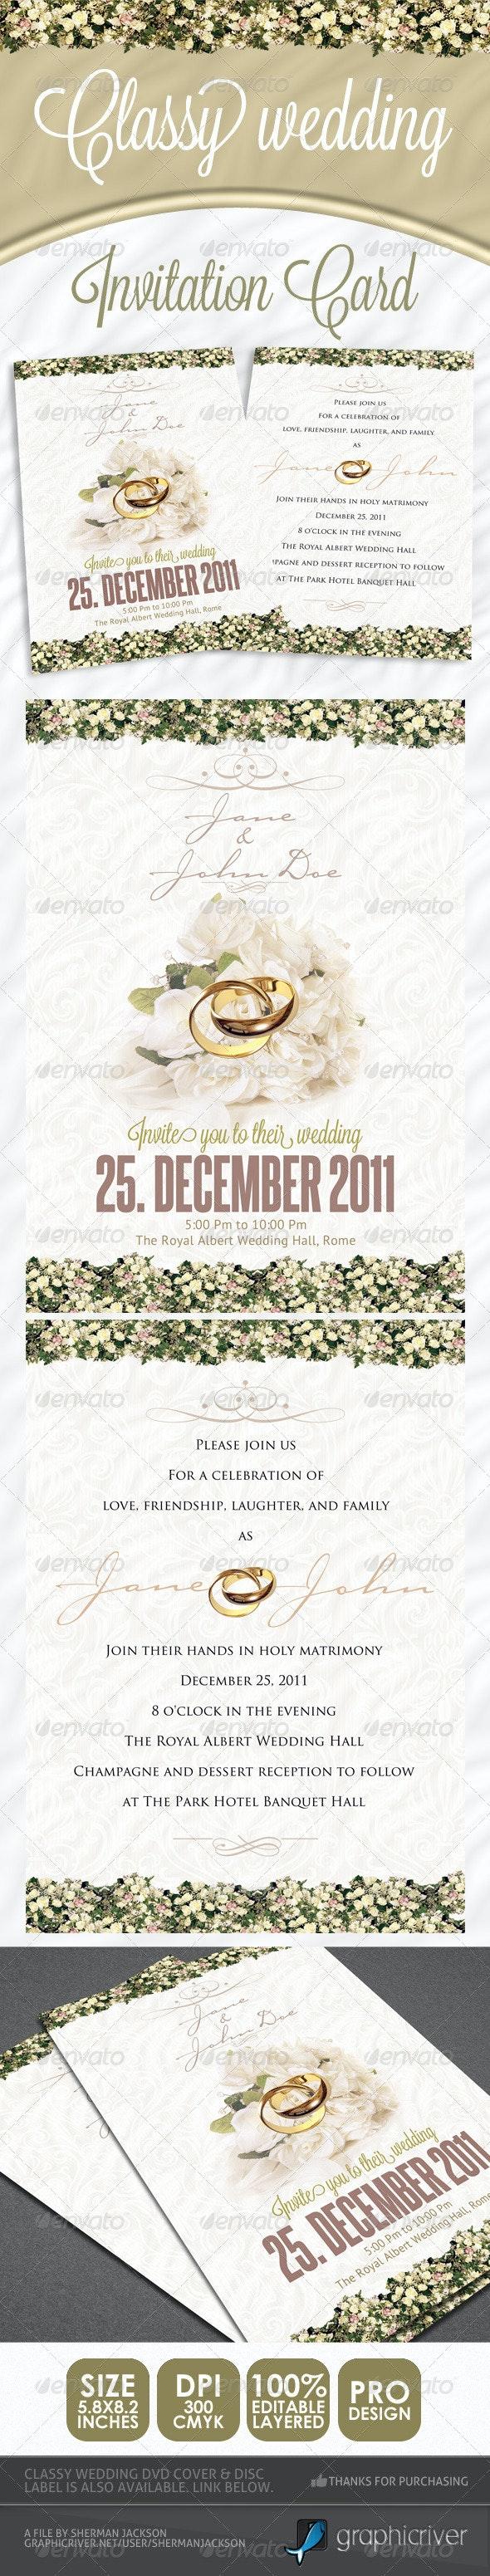 Classy Wedding Invitations - Weddings Cards & Invites